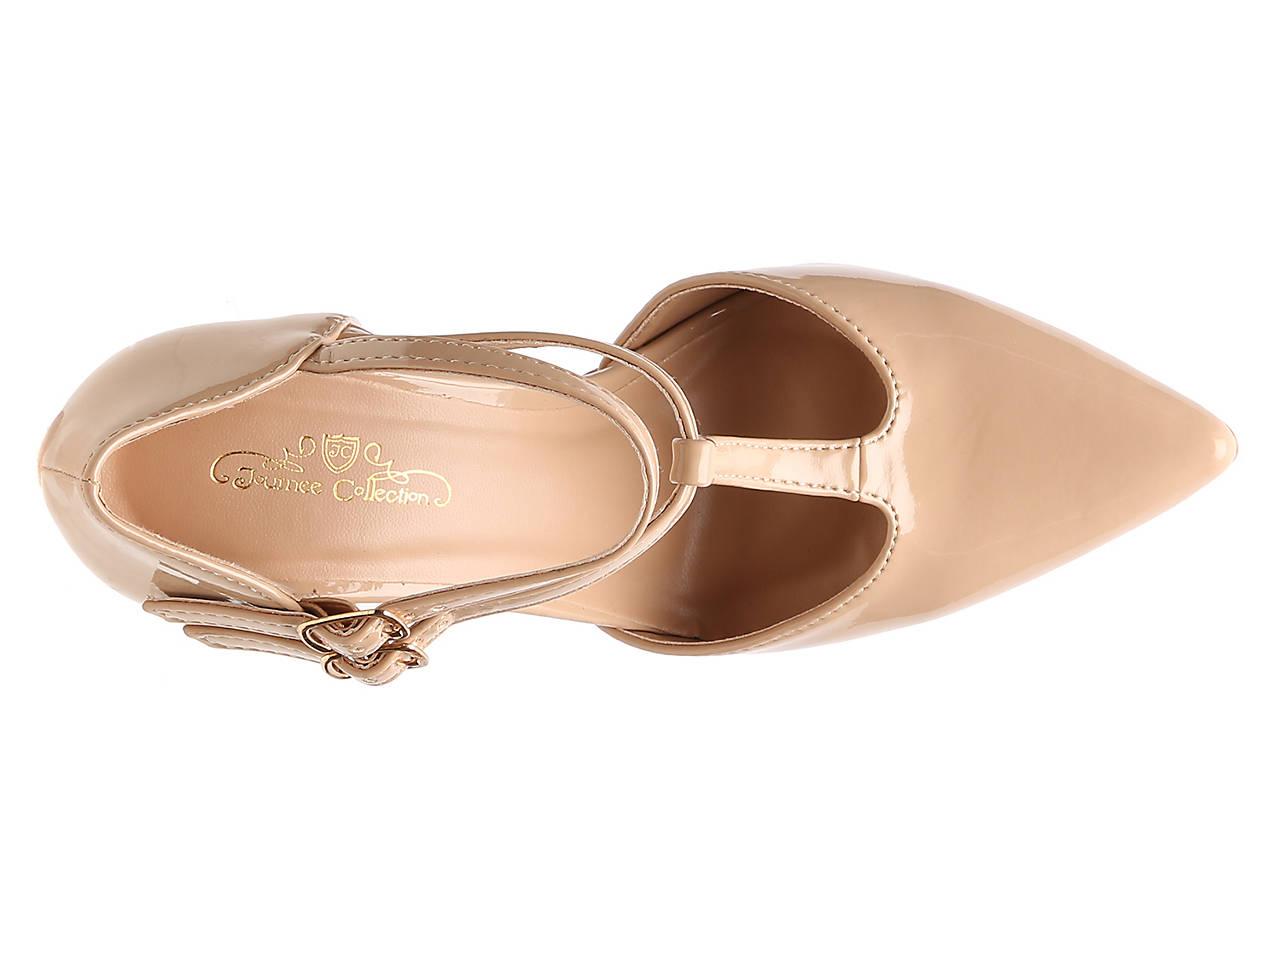 f87642e56baa Journee Collection Tru Pump Women s Shoes